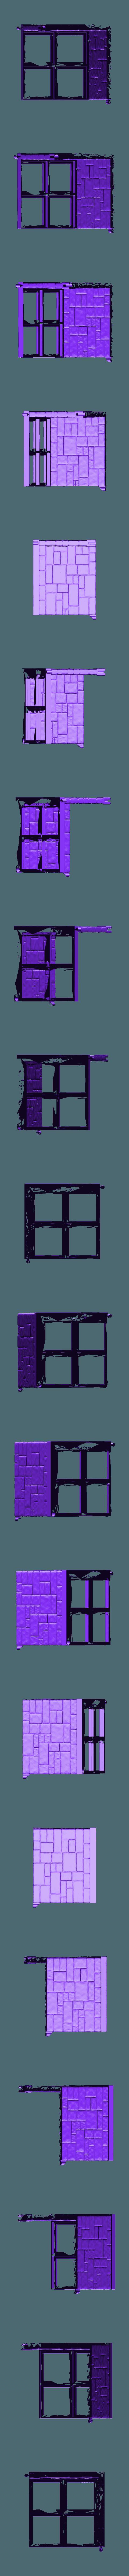 ZDungeon_Corner_A.stl Download free STL file ZDungeon (experimental dungeon tiles) • 3D printable object, Dutchmogul